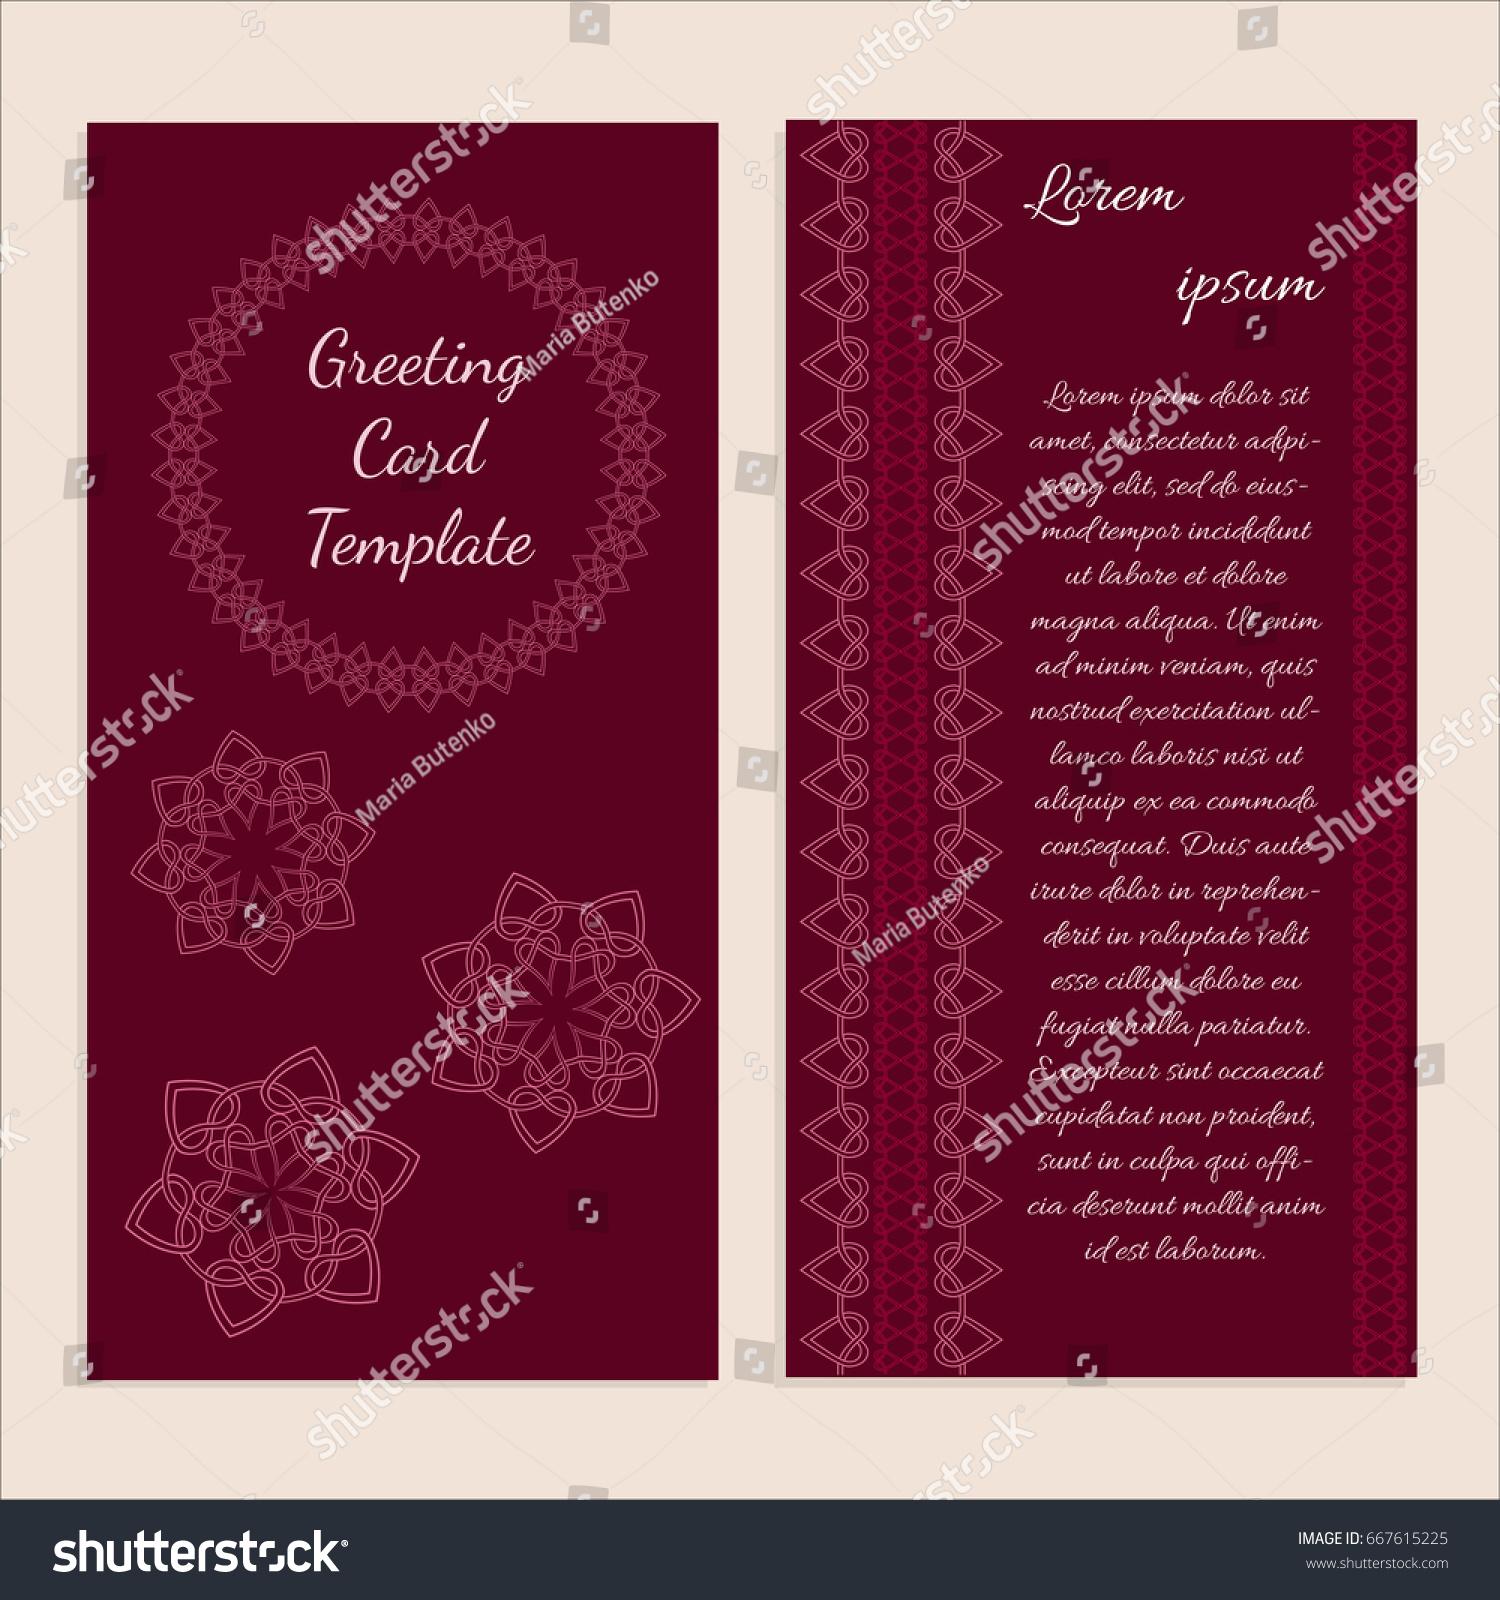 Templates Greeting Wedding Invitation Cards Brochures Stock Vector ...